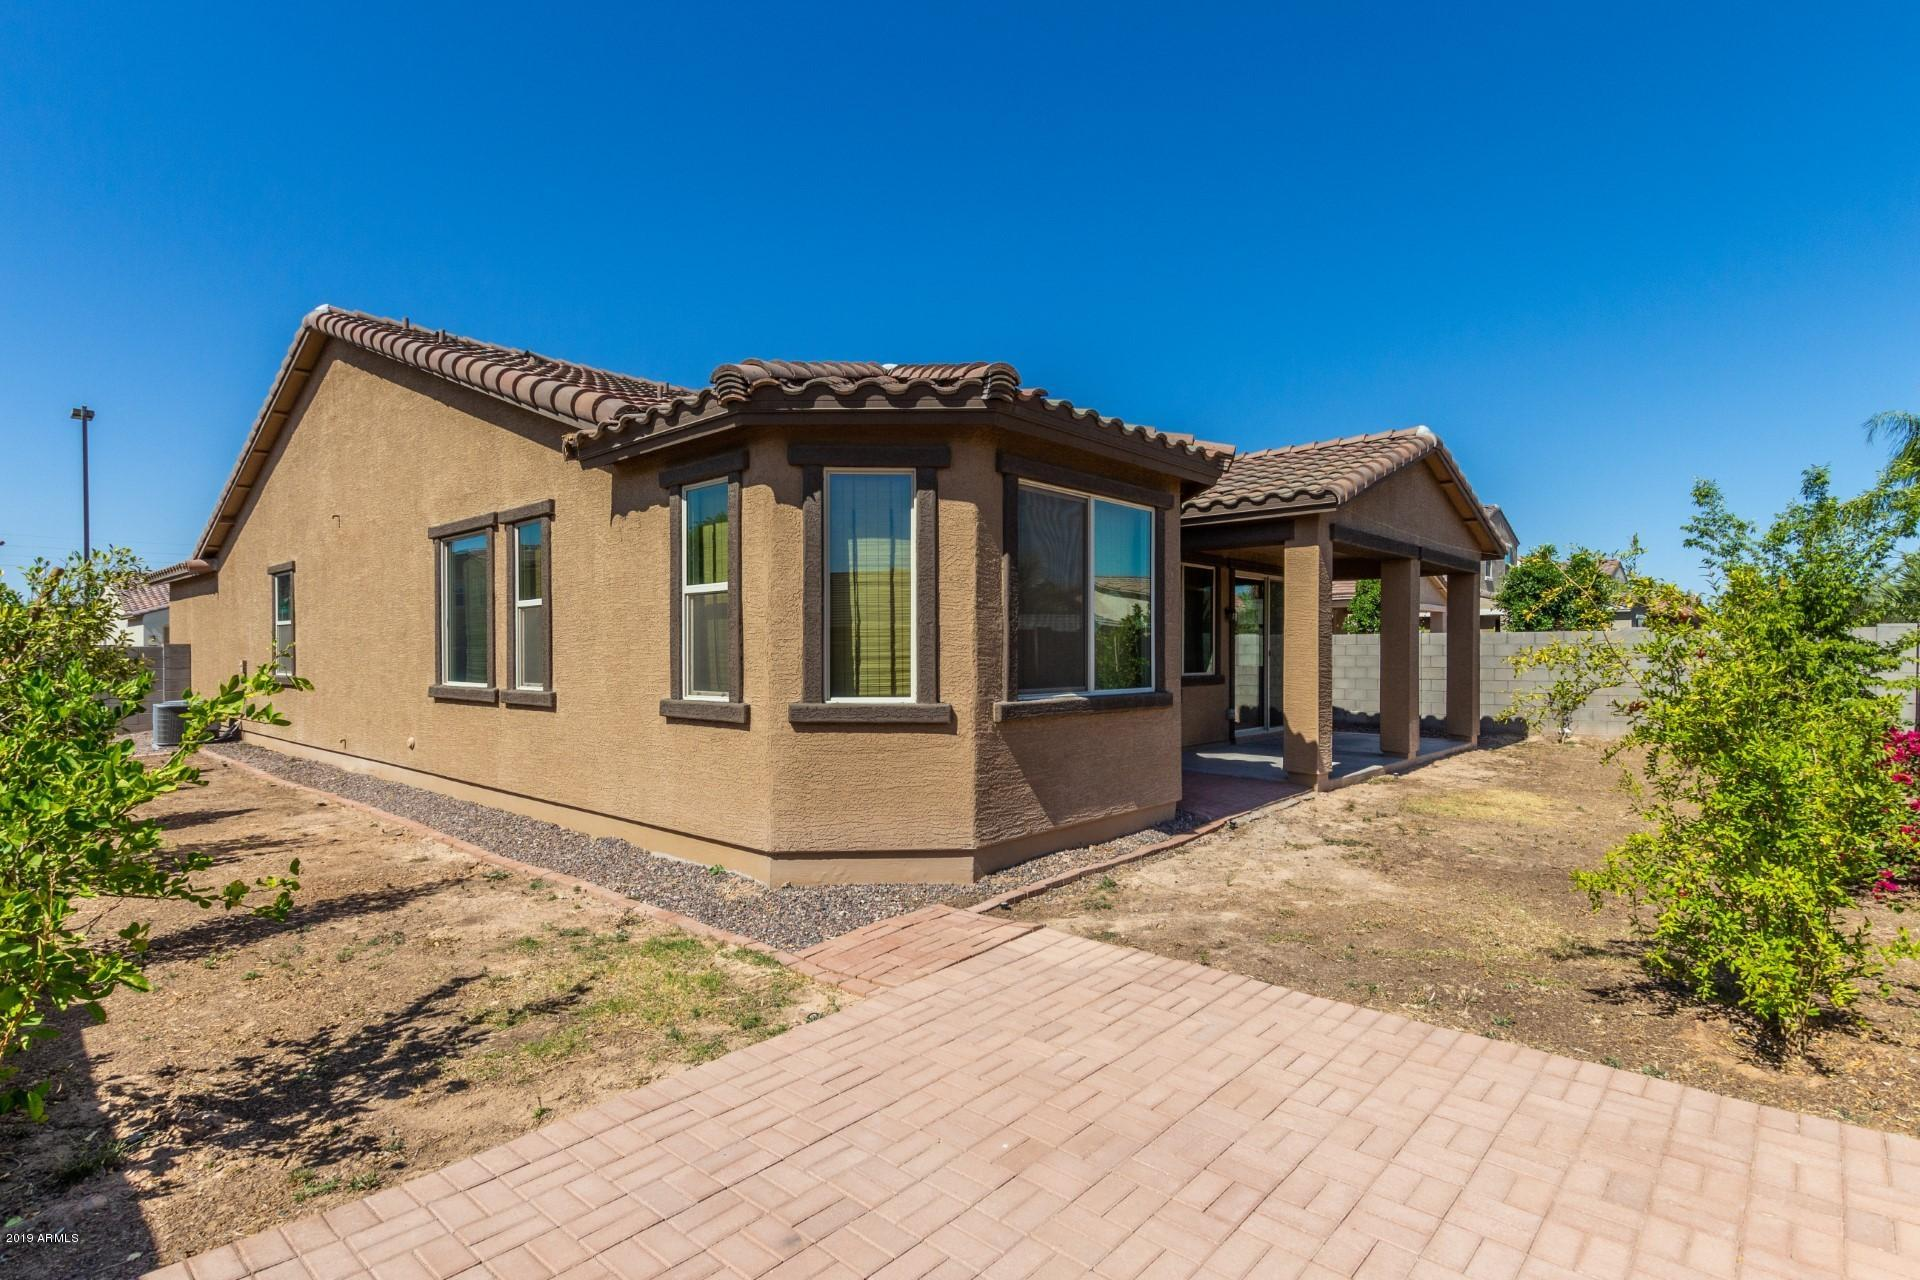 MLS 5928659 16889 W MONROE Street, Goodyear, AZ 85338 Goodyear AZ Canyon Trails